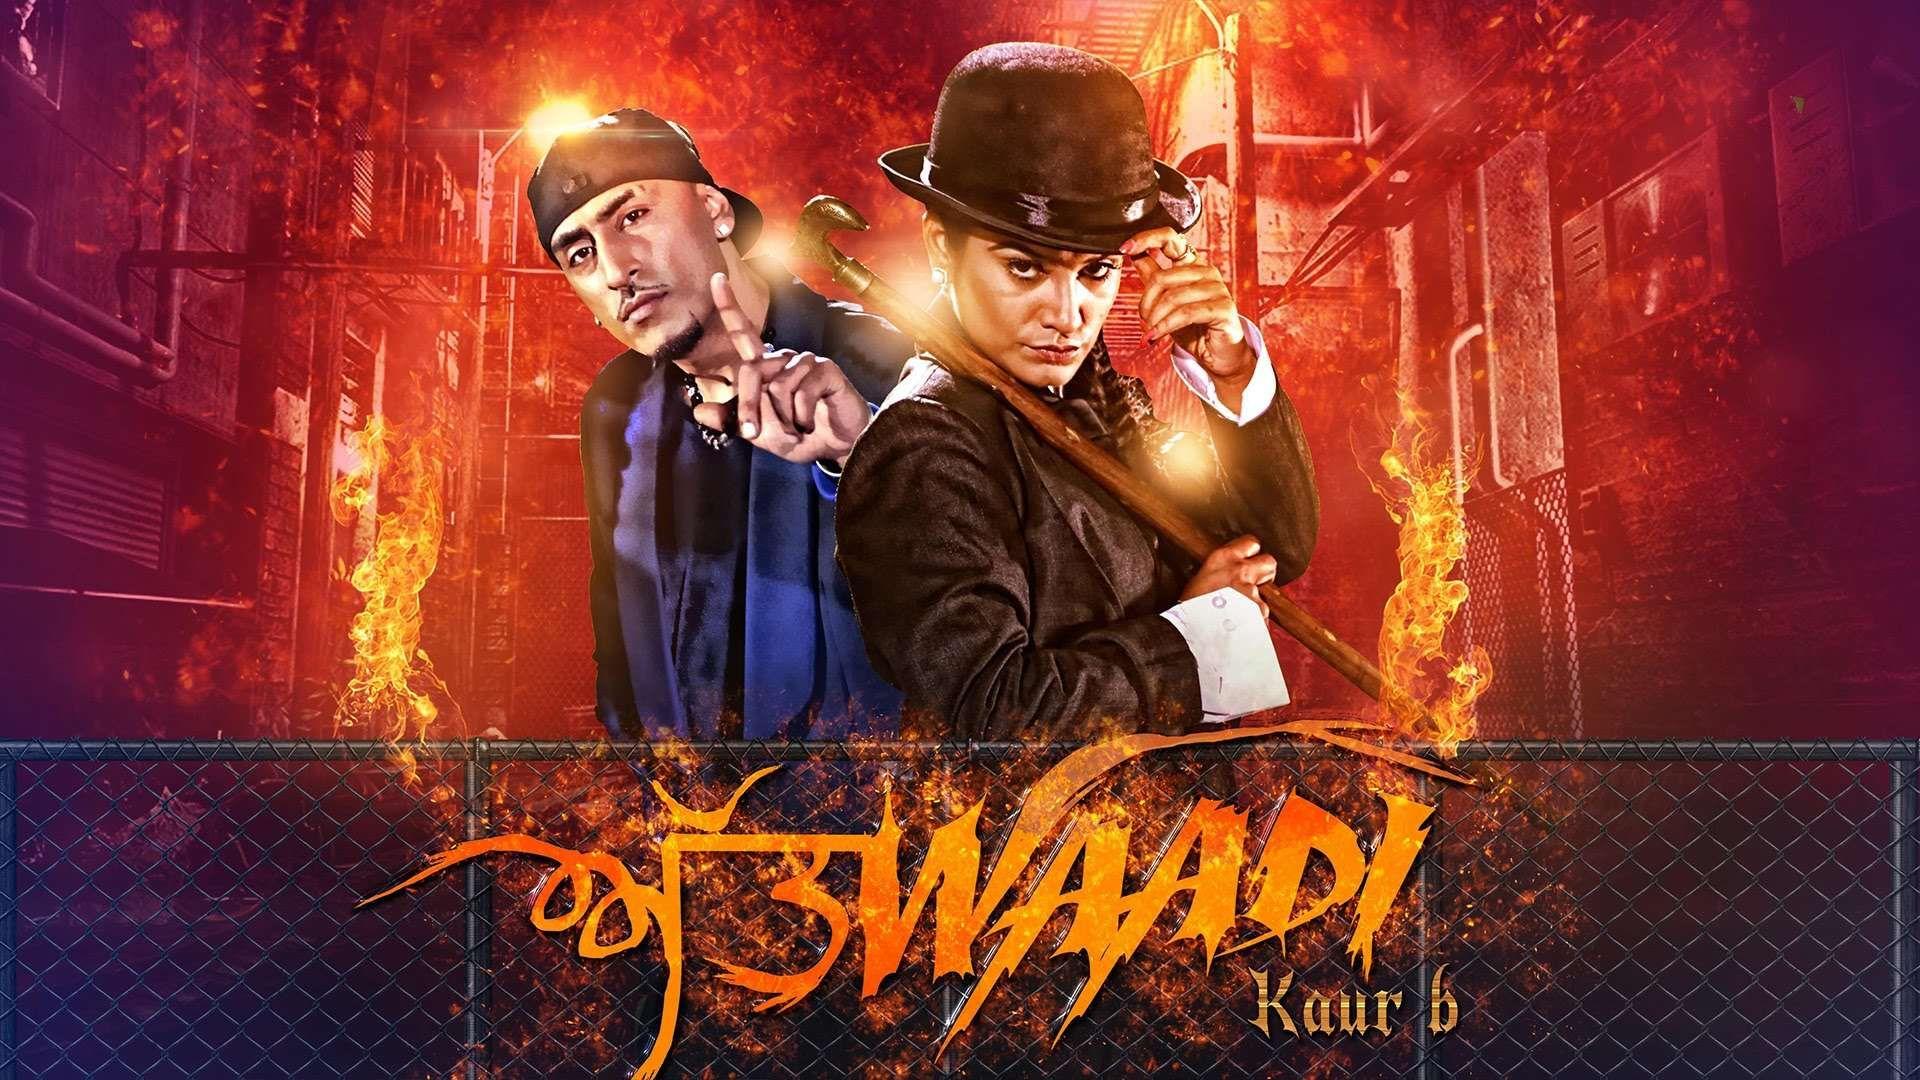 Punjabi Music Songs Latest mp3 Kaur b, Latest music